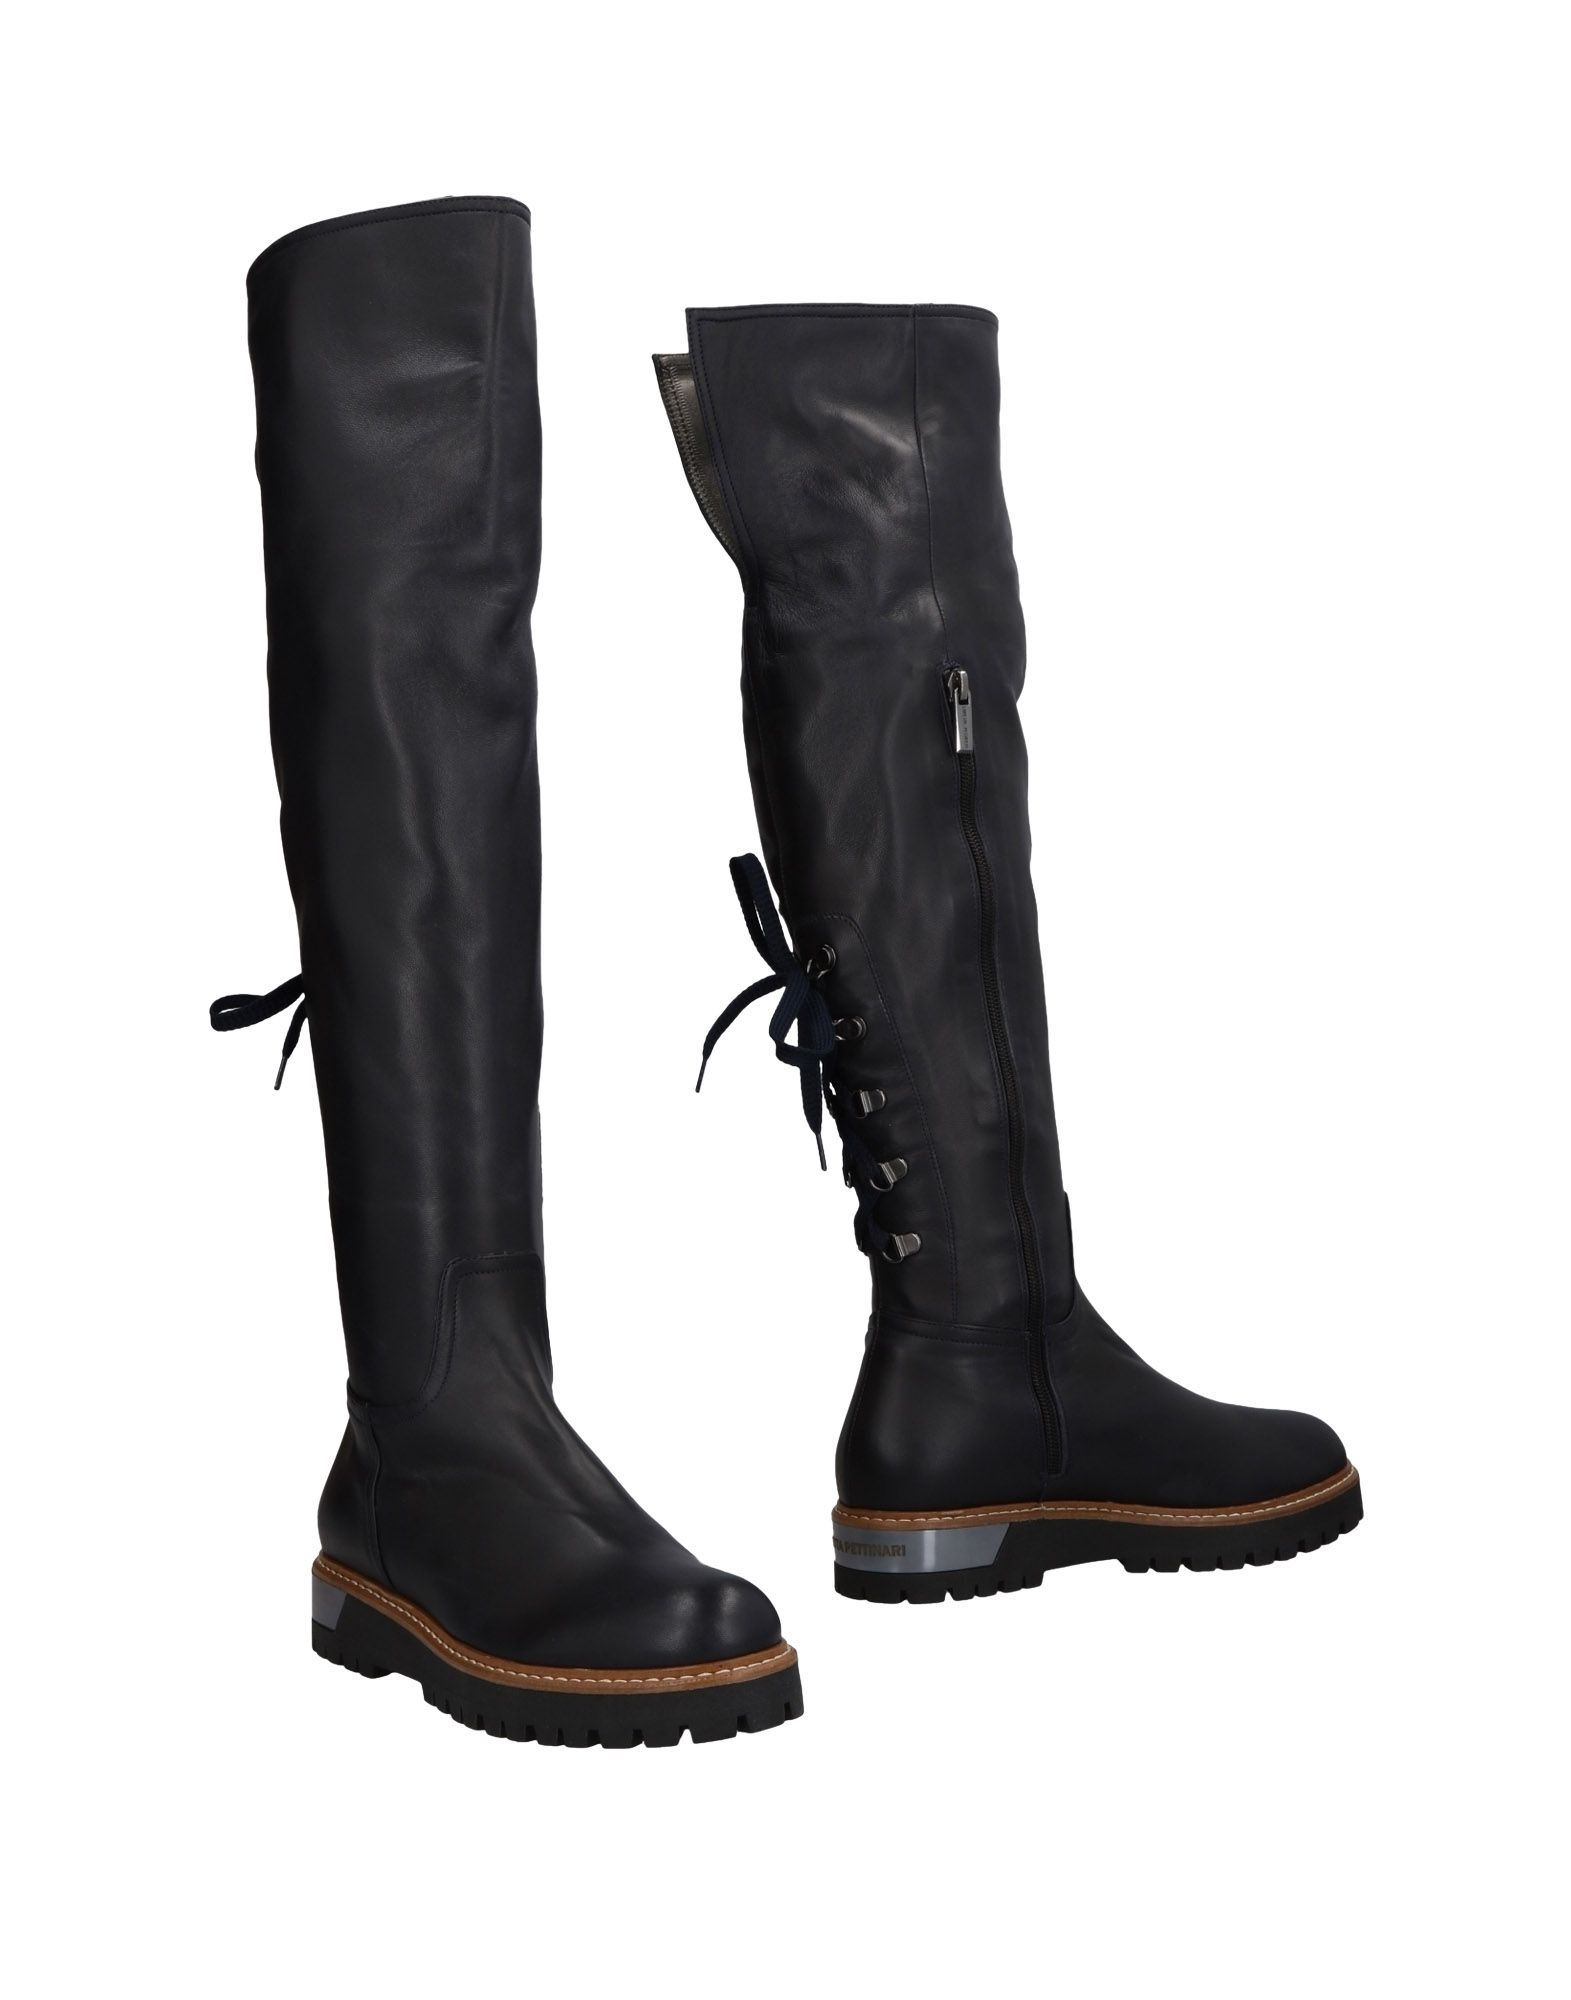 Loretta Loretta Pettinari Boots - Women Loretta Loretta Pettinari Boots online on  Canada - 11476798IO cc8bab